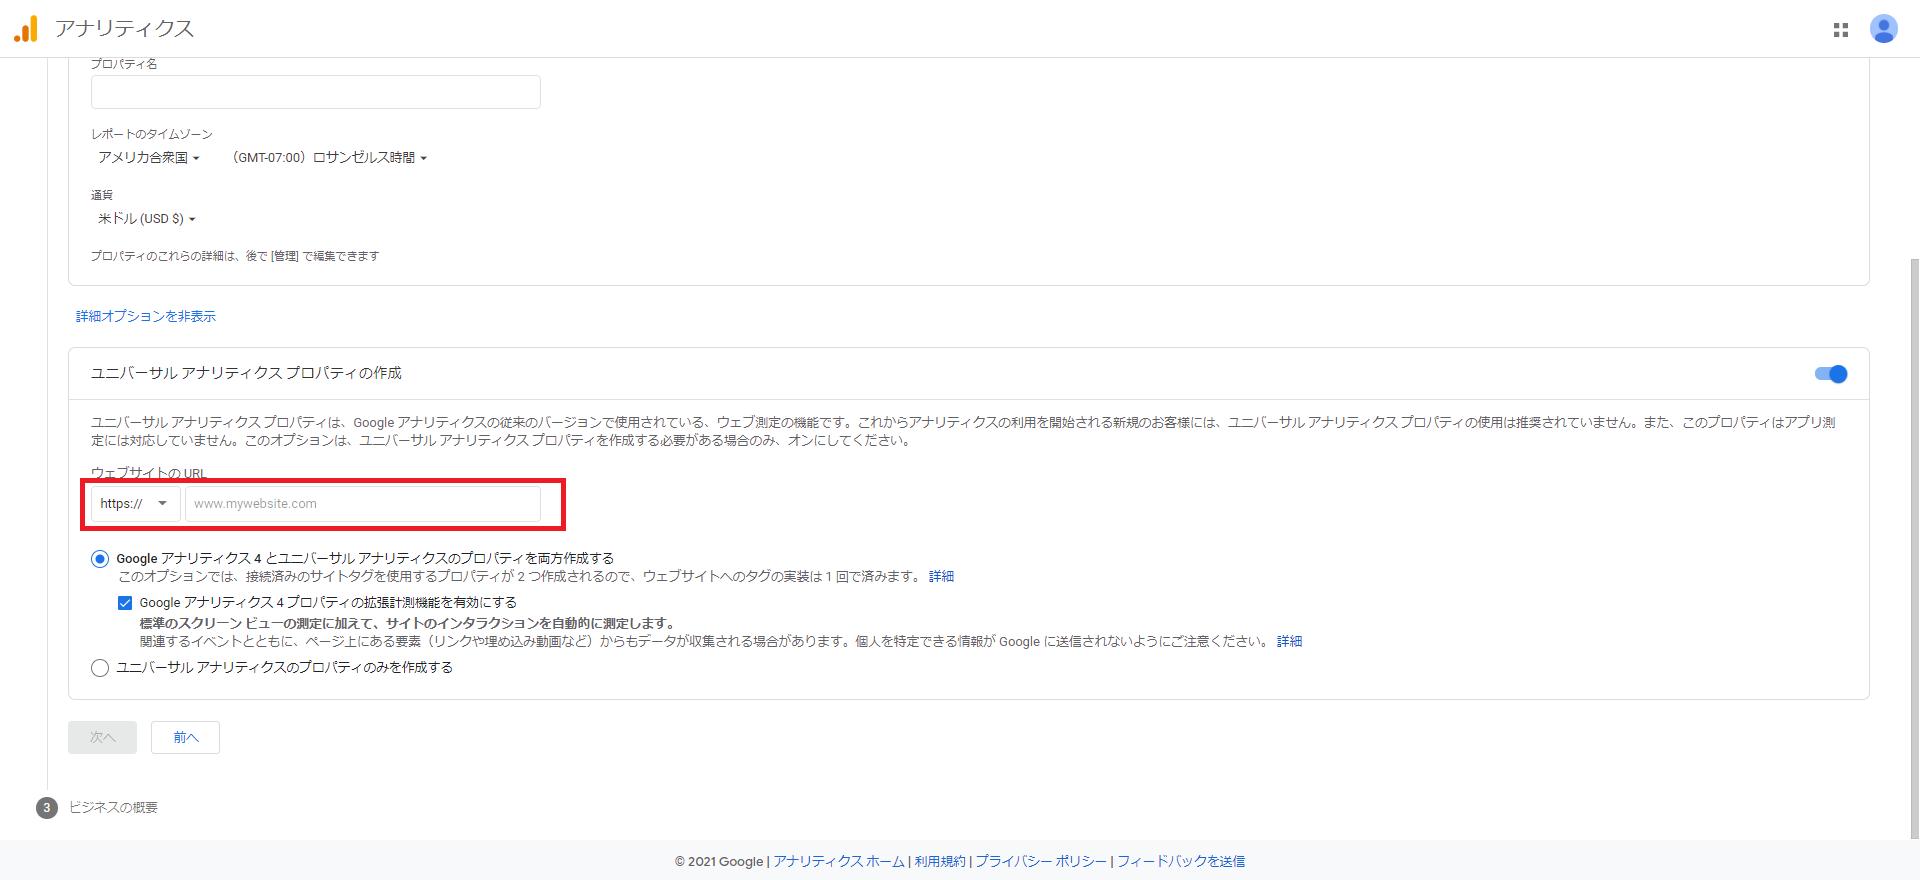 Googleアナリティクス プロパティの設定 プロパティの詳細 詳細オプションURL入力